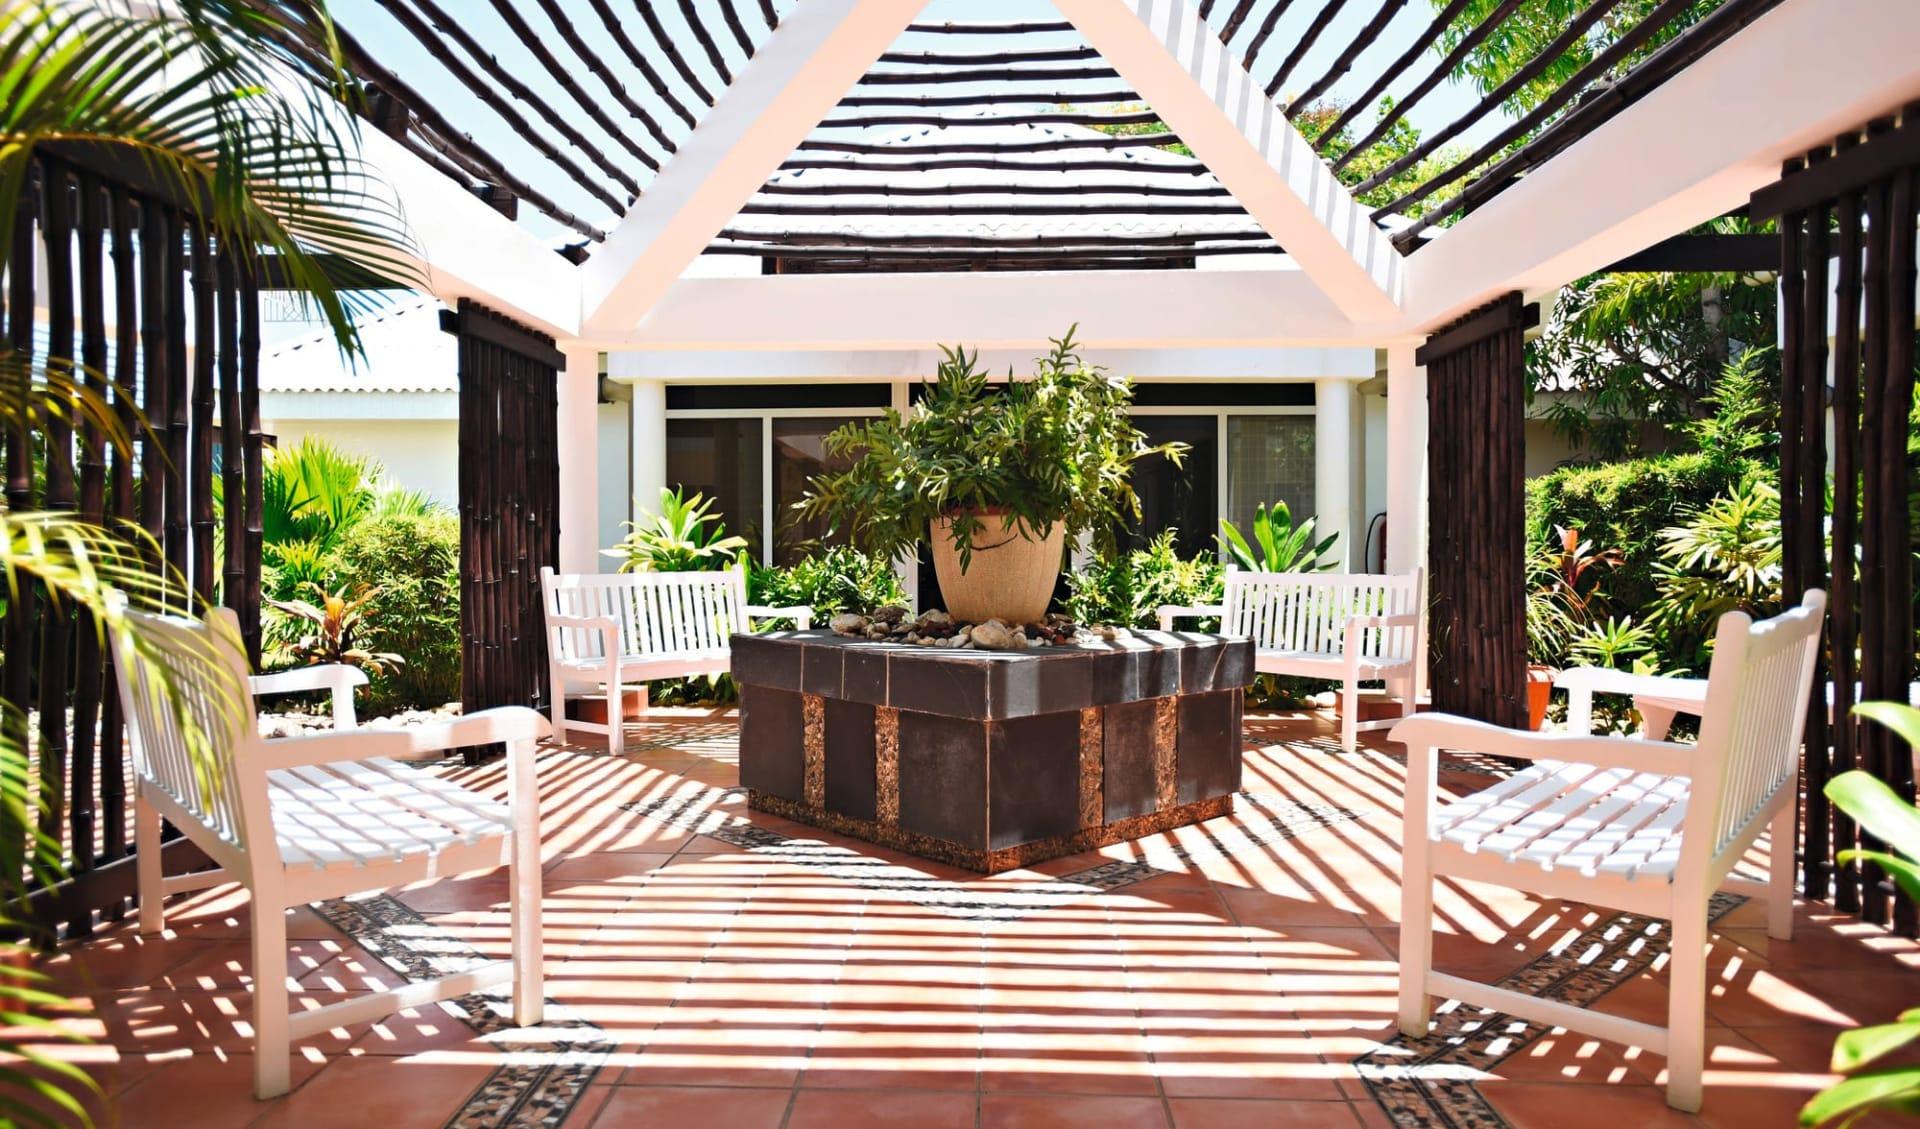 Royalton Hicacos in Varadero: exterior Royalton Hicacos - Garden, Sitting Area, Lounge - Latinconnect